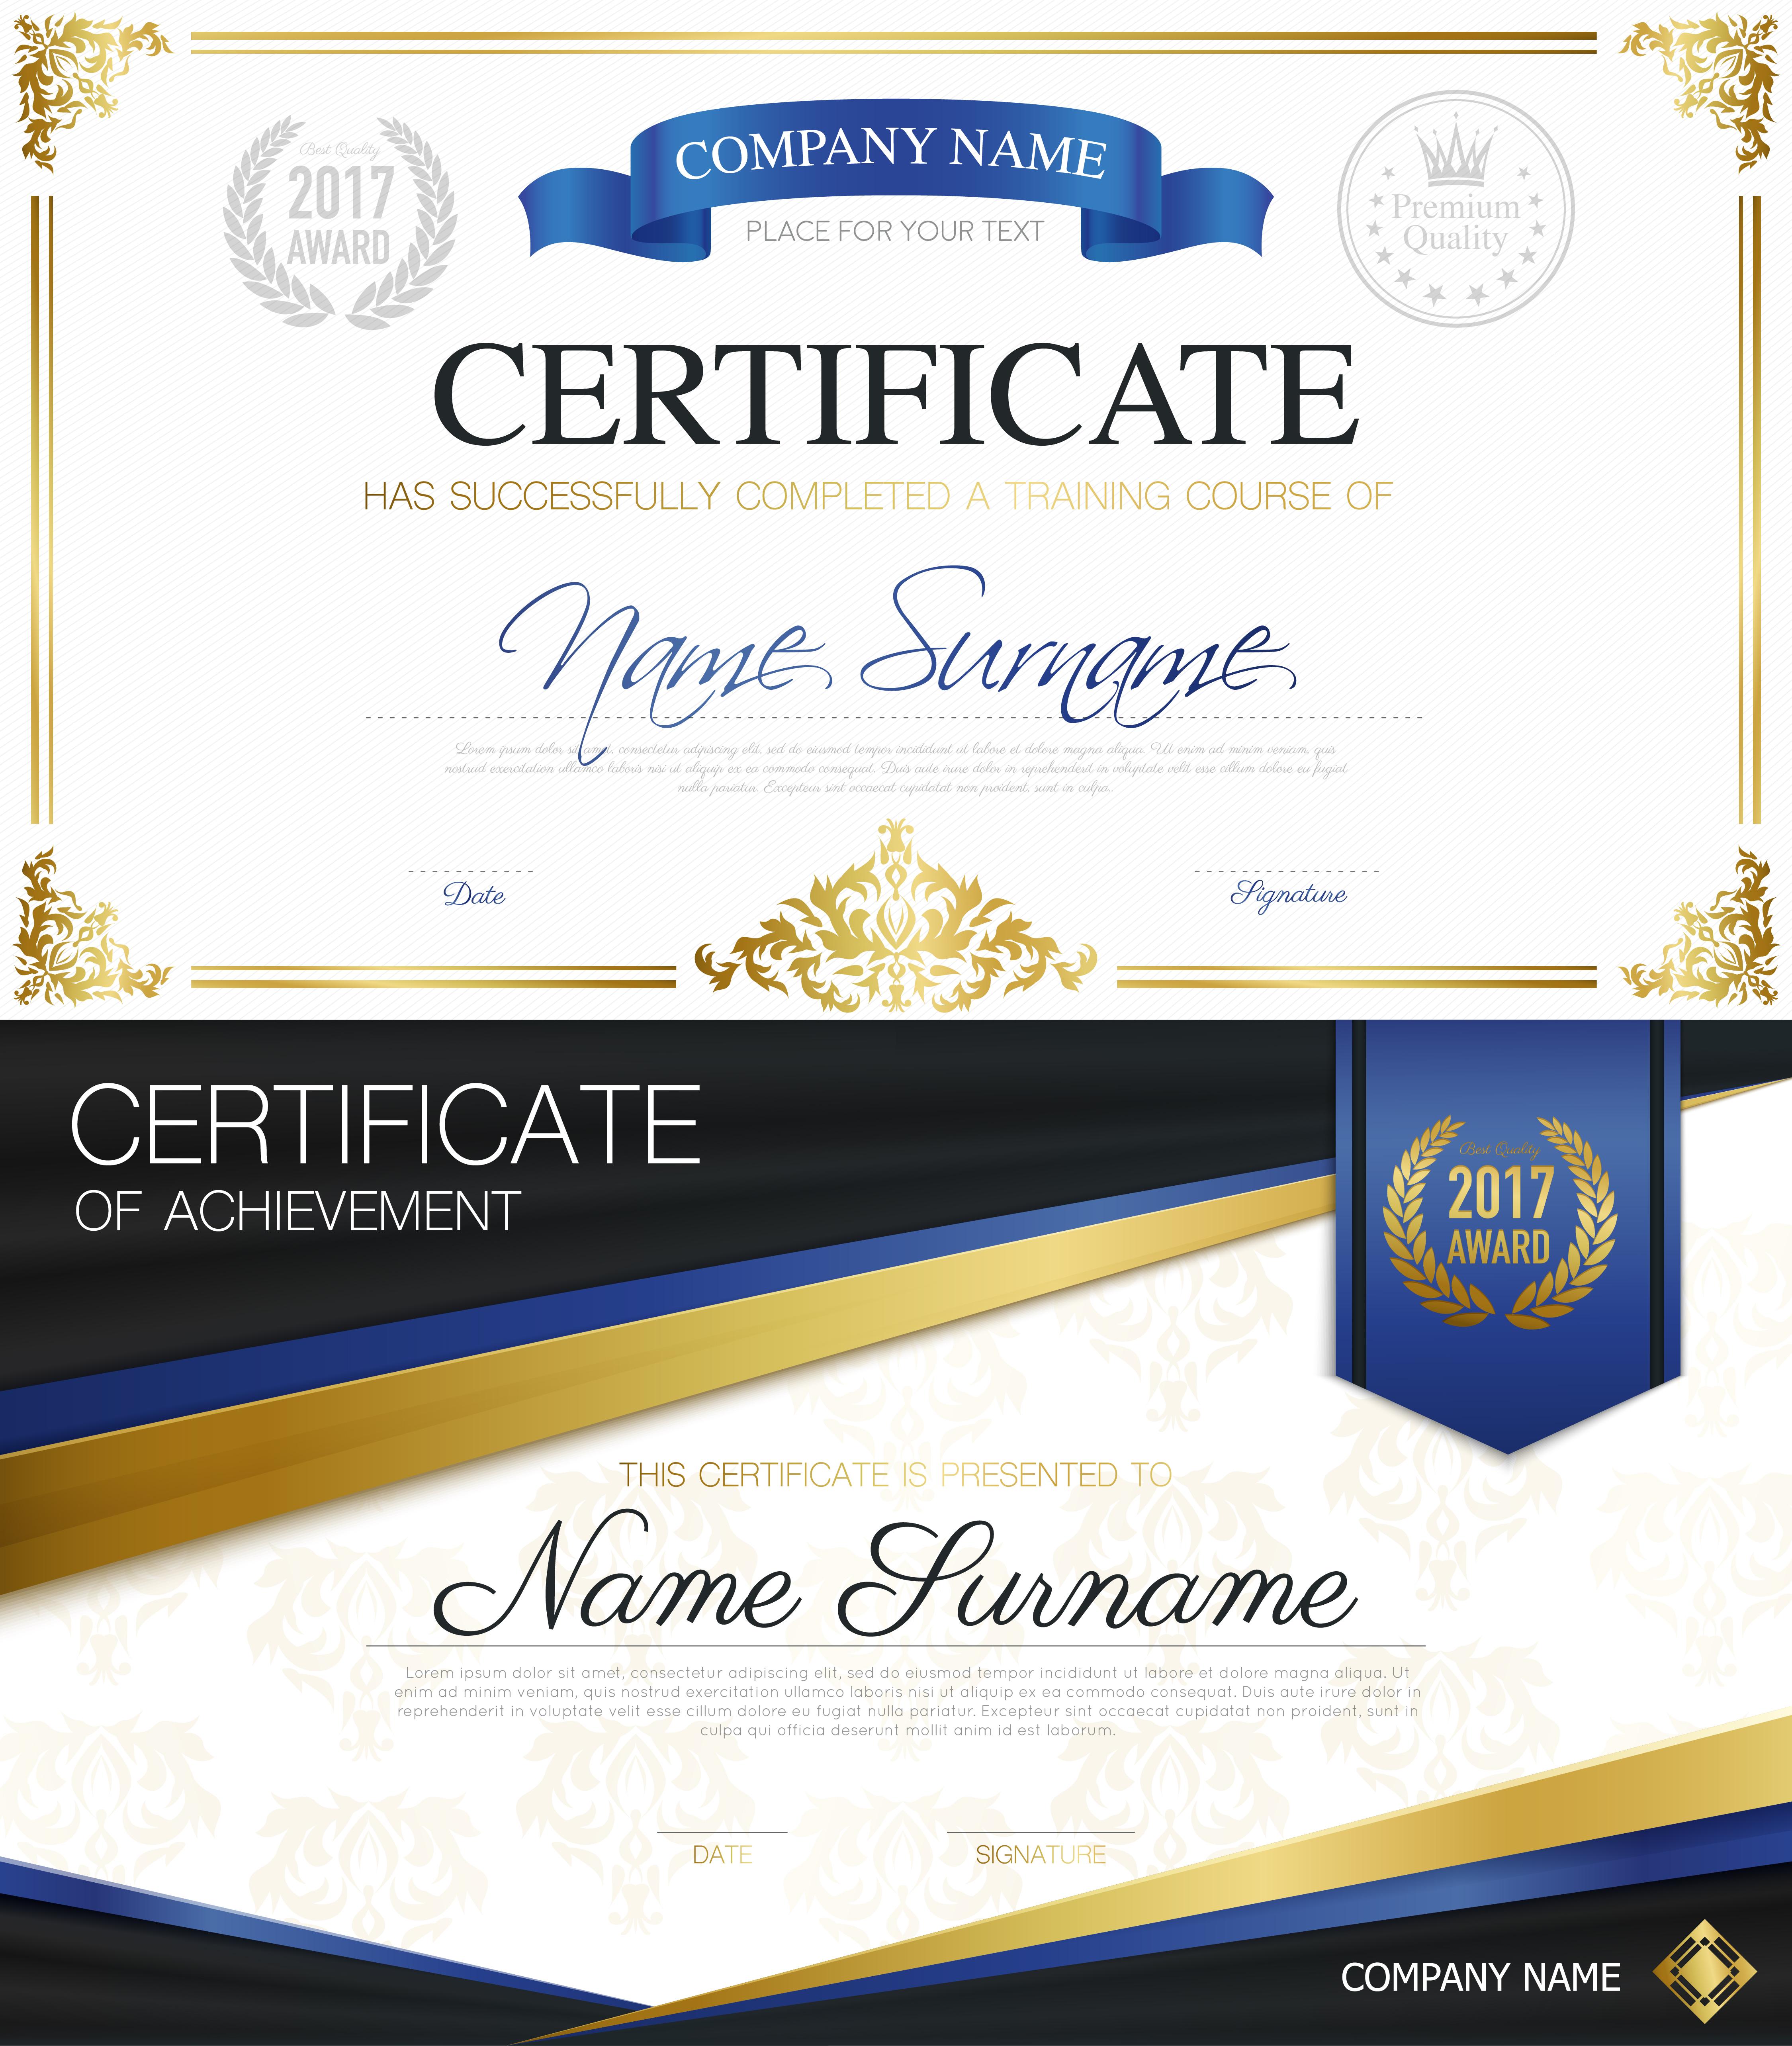 certificates certificate vector elegant classic diploma template illustration golden completion christmas gold stylish ribbon freepik vecteezy leaves tree poem rain